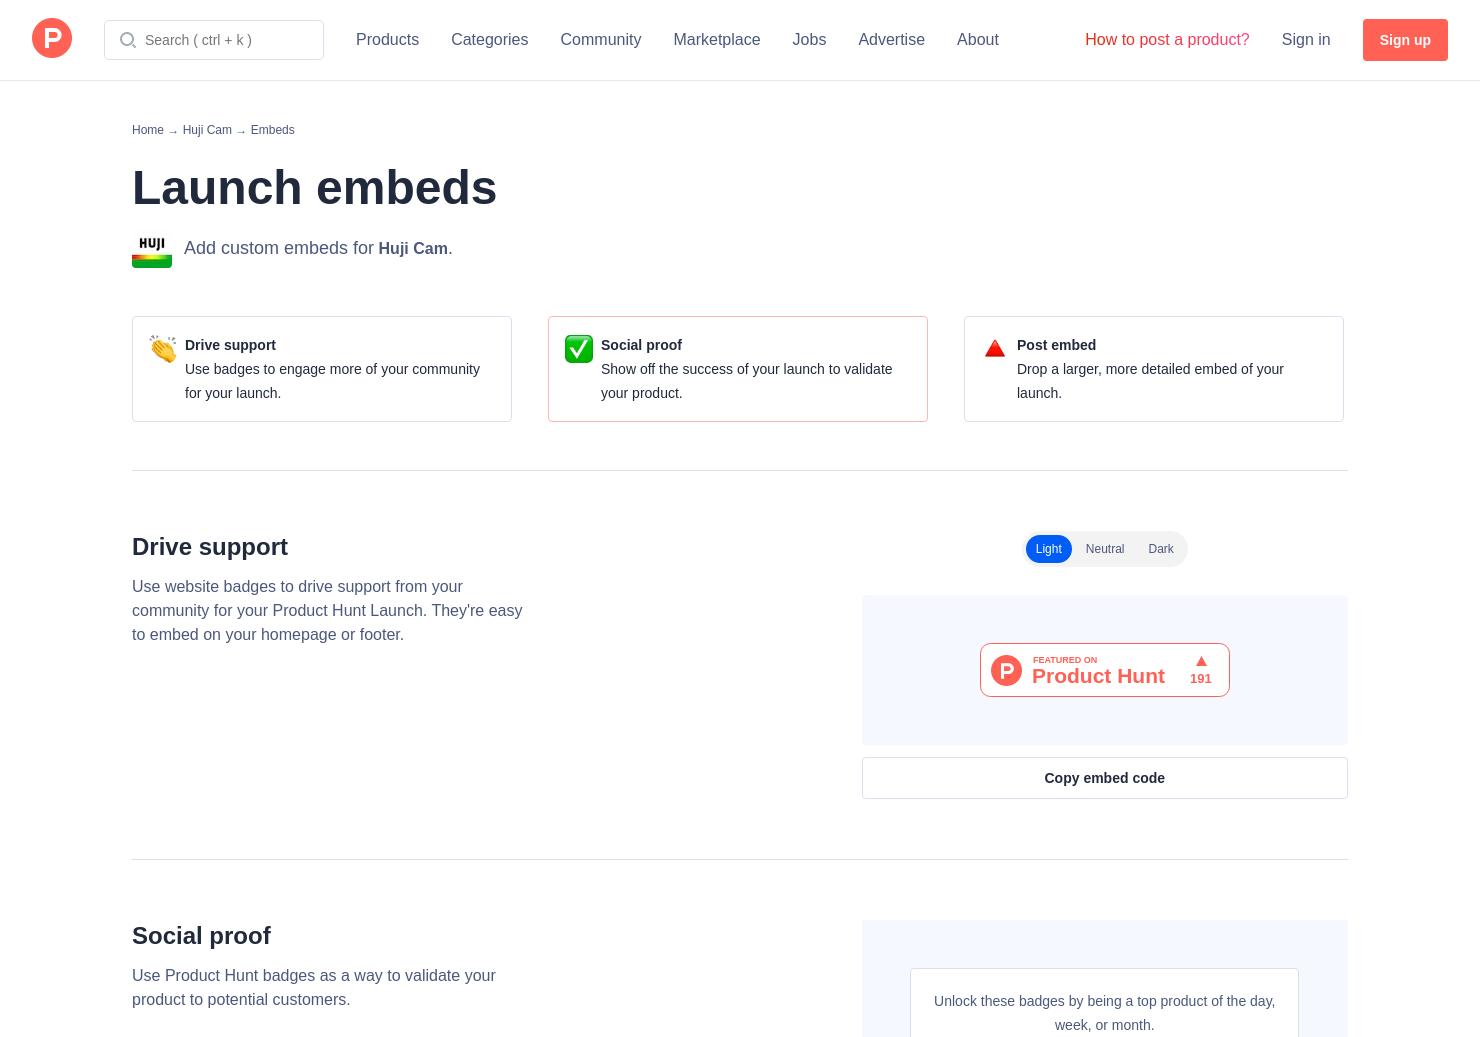 Badges & Embeds | Product Hunt